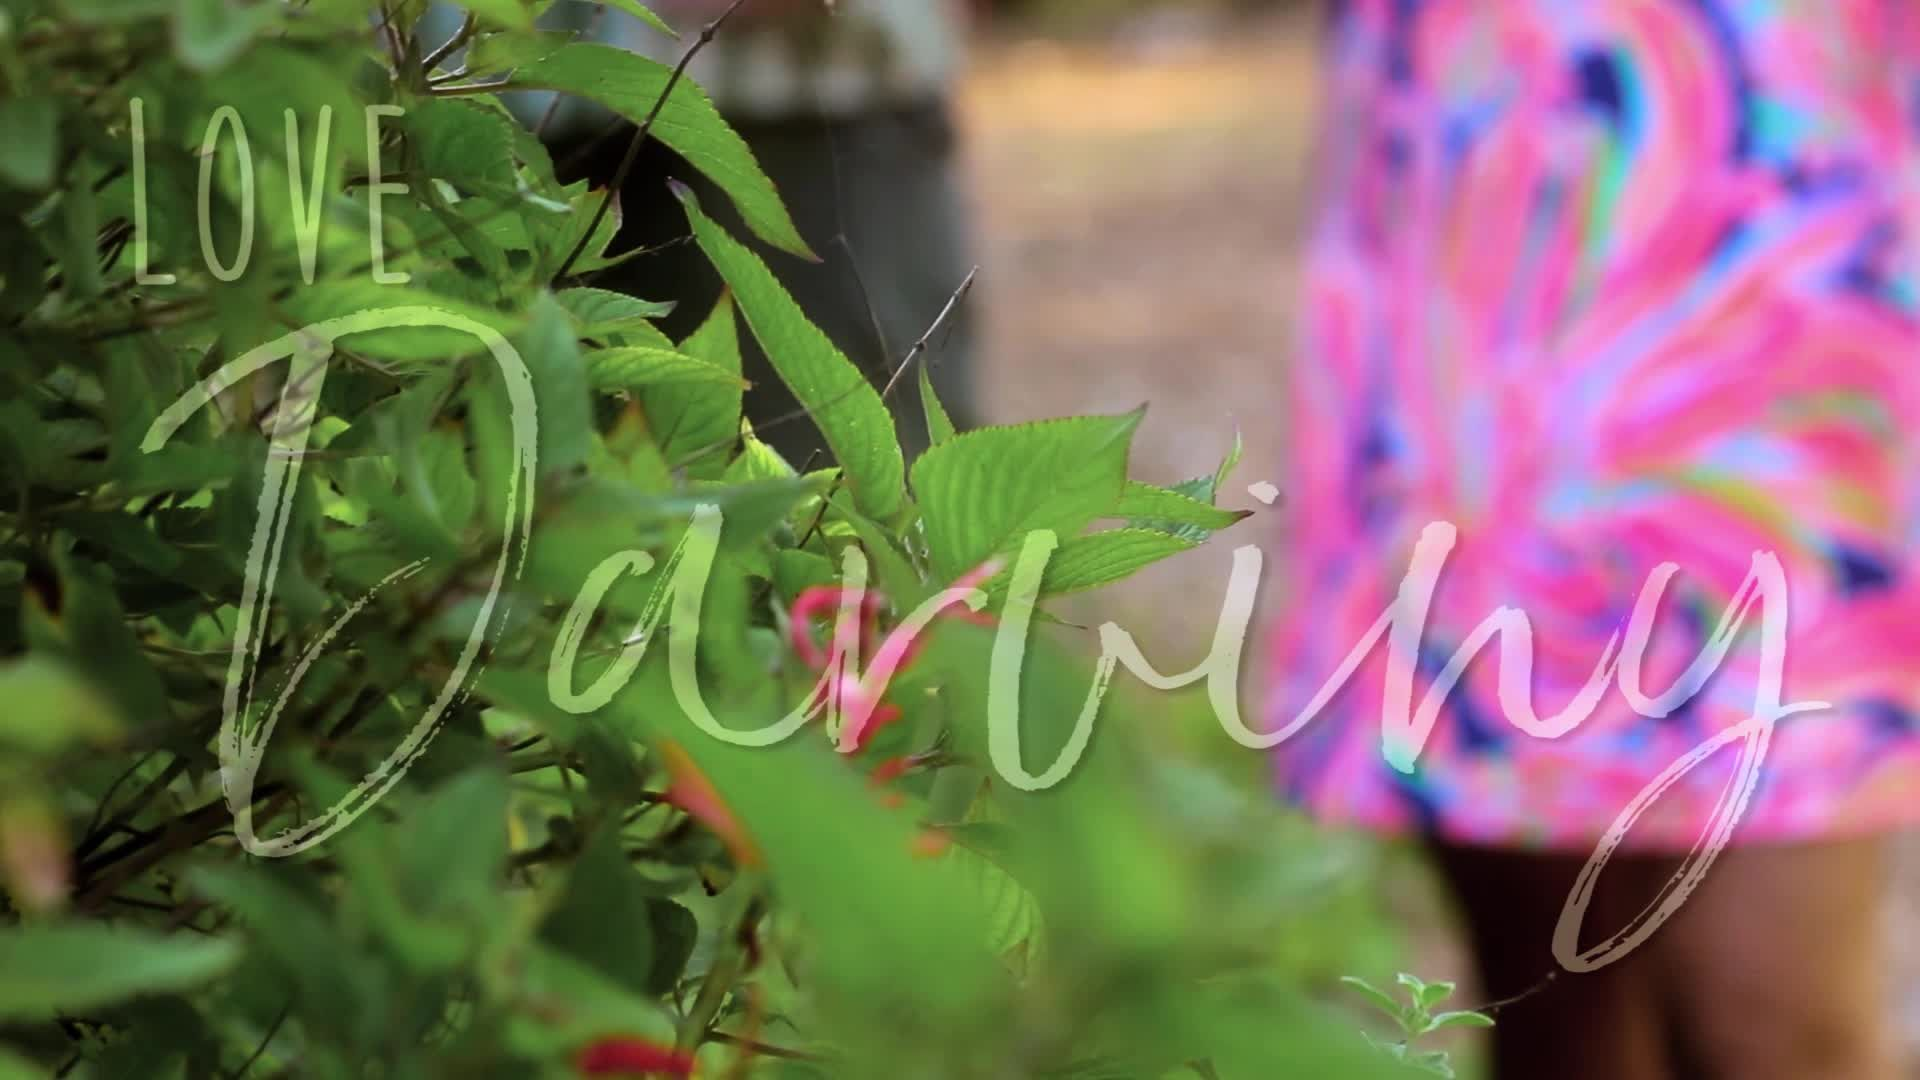 The Love, Darviny Show - Fruit & Spice Park Trailer